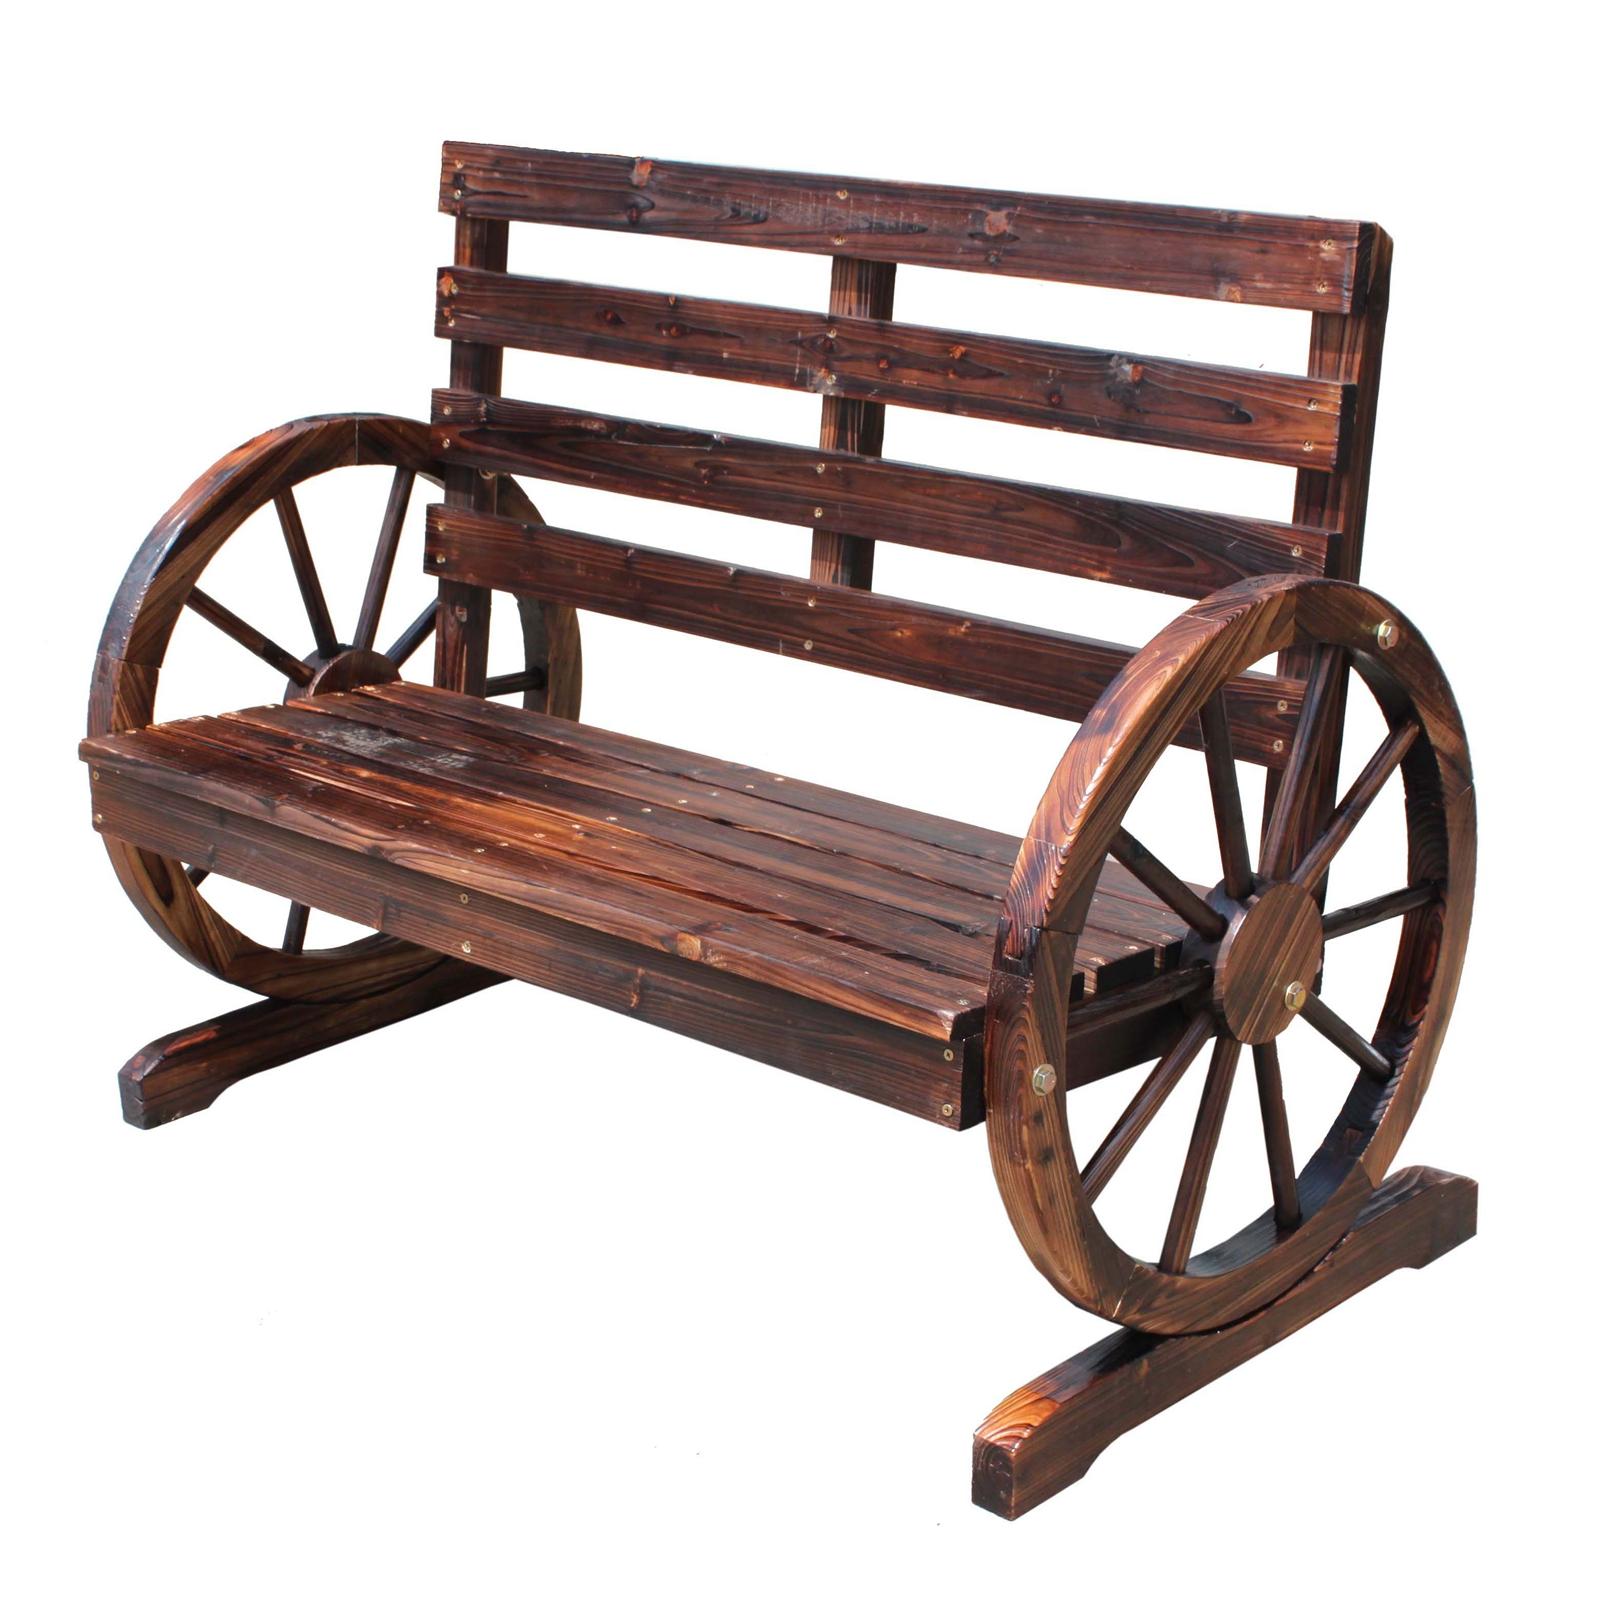 FoxHunter Wooden Garden Wheel Bench 2 Seat Seater Burnt Wood Outdoor Park WGB05